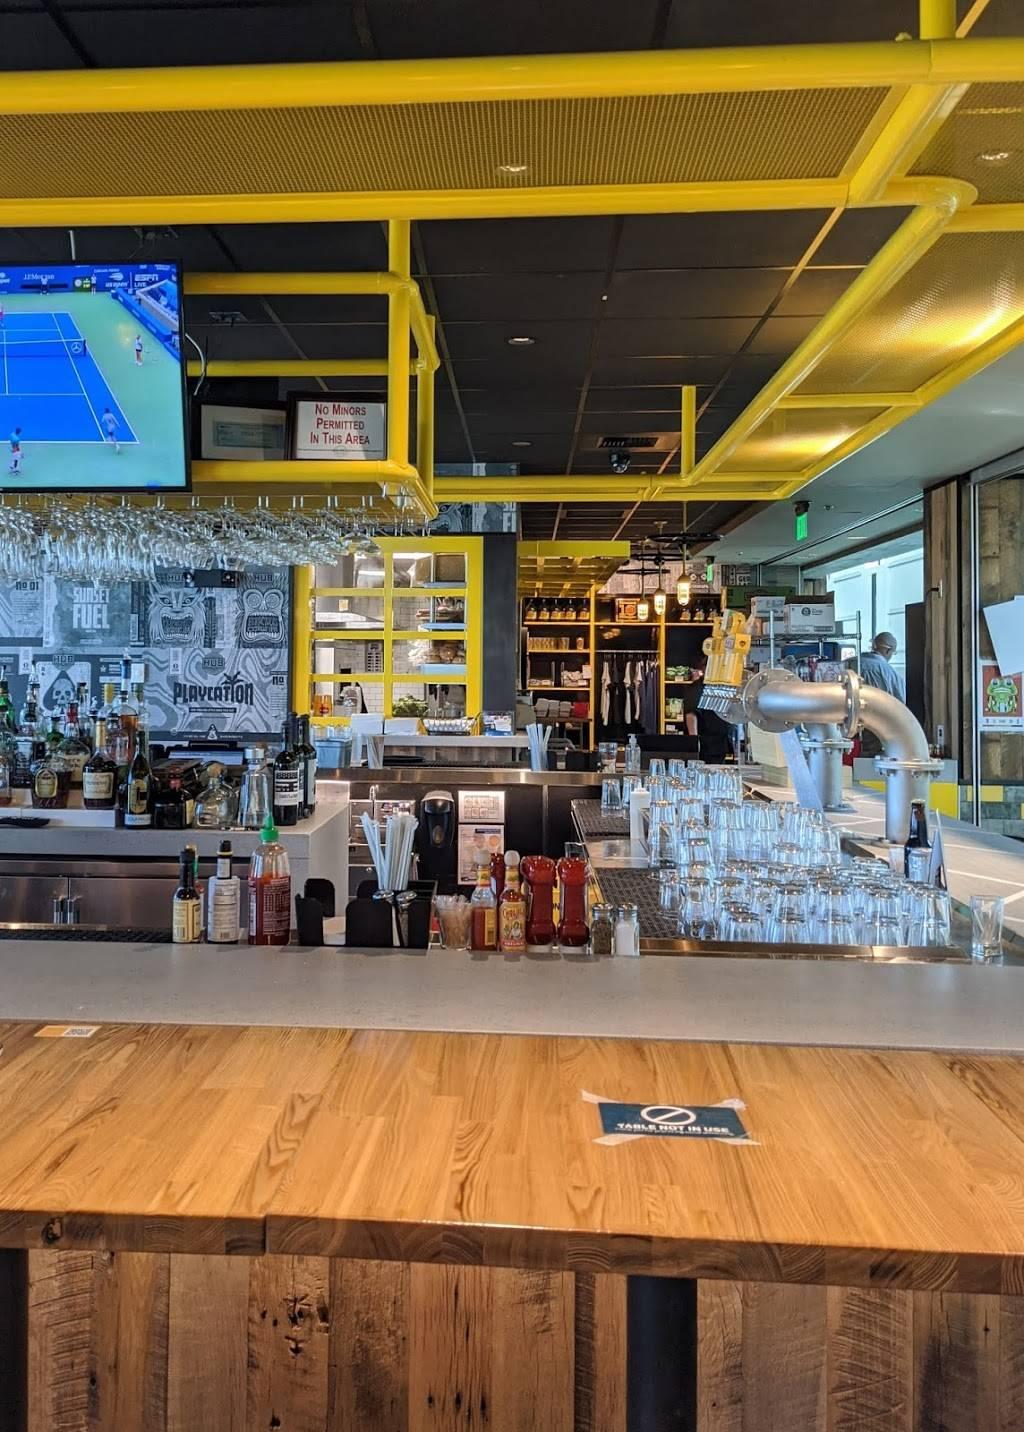 Hopworks Urban Brewery - restaurant  | Photo 7 of 8 | Address: PDX AIRPORT 7000 NE Airport Way, Concourse E, Portland, OR 97218, USA | Phone: (571) 982-0358